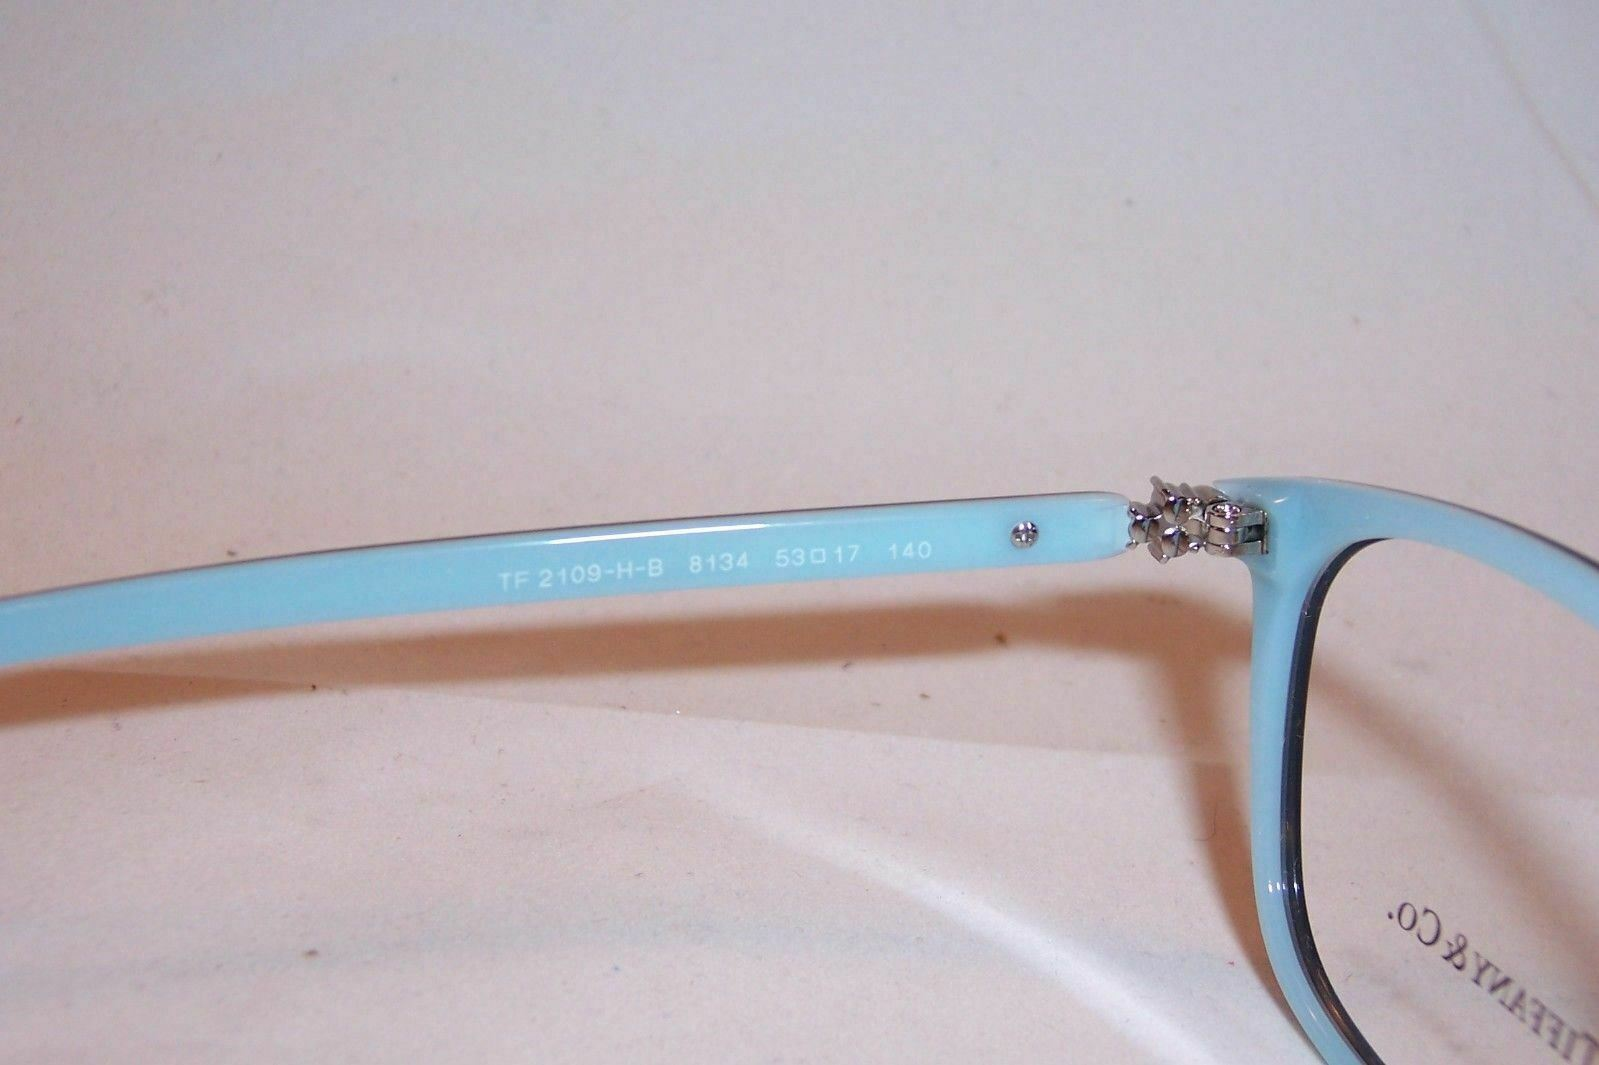 d17912217e9b Authentic Tiffany   Co. Tortoise RX Eyeglasses TF 2109hb - 8134 53mm for  sale online